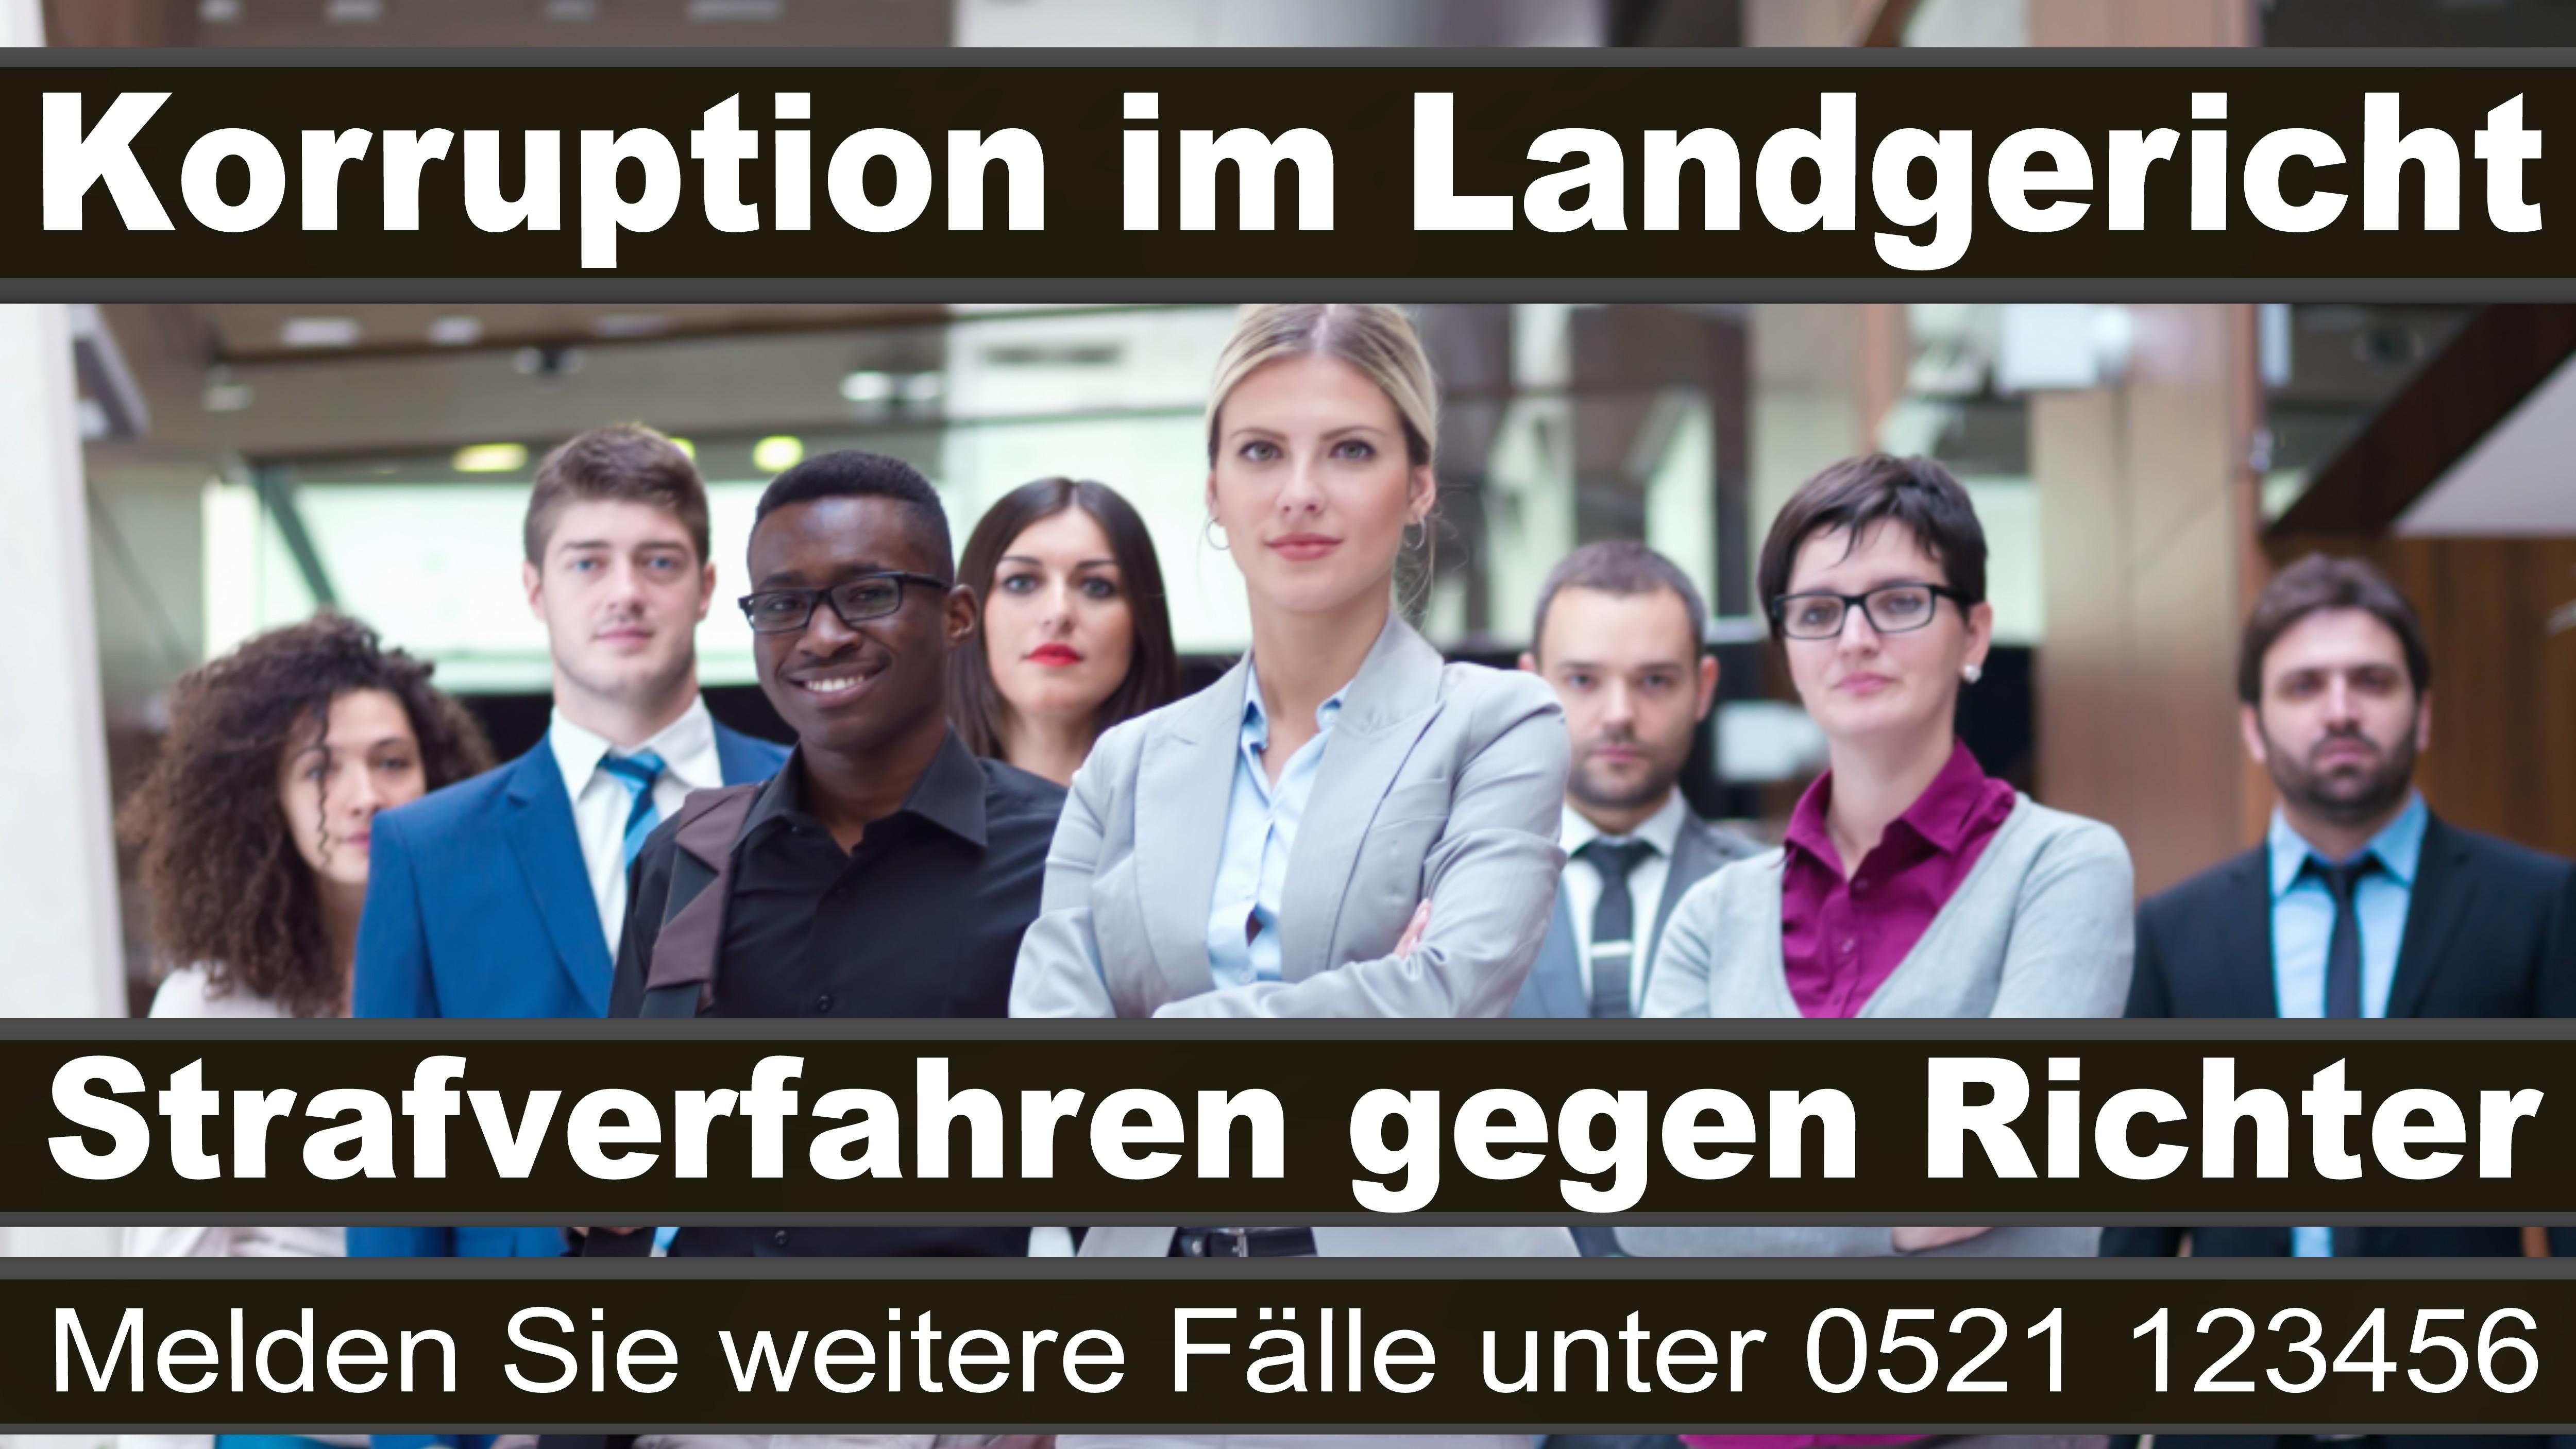 Korruption, Rechtsbeugung, Parteiverrat, Rechtsanwalt, Justiz, Präsident, Direktor, Leitender Oberstaatsanwalt, Freistaat Thüringen Justizministerium